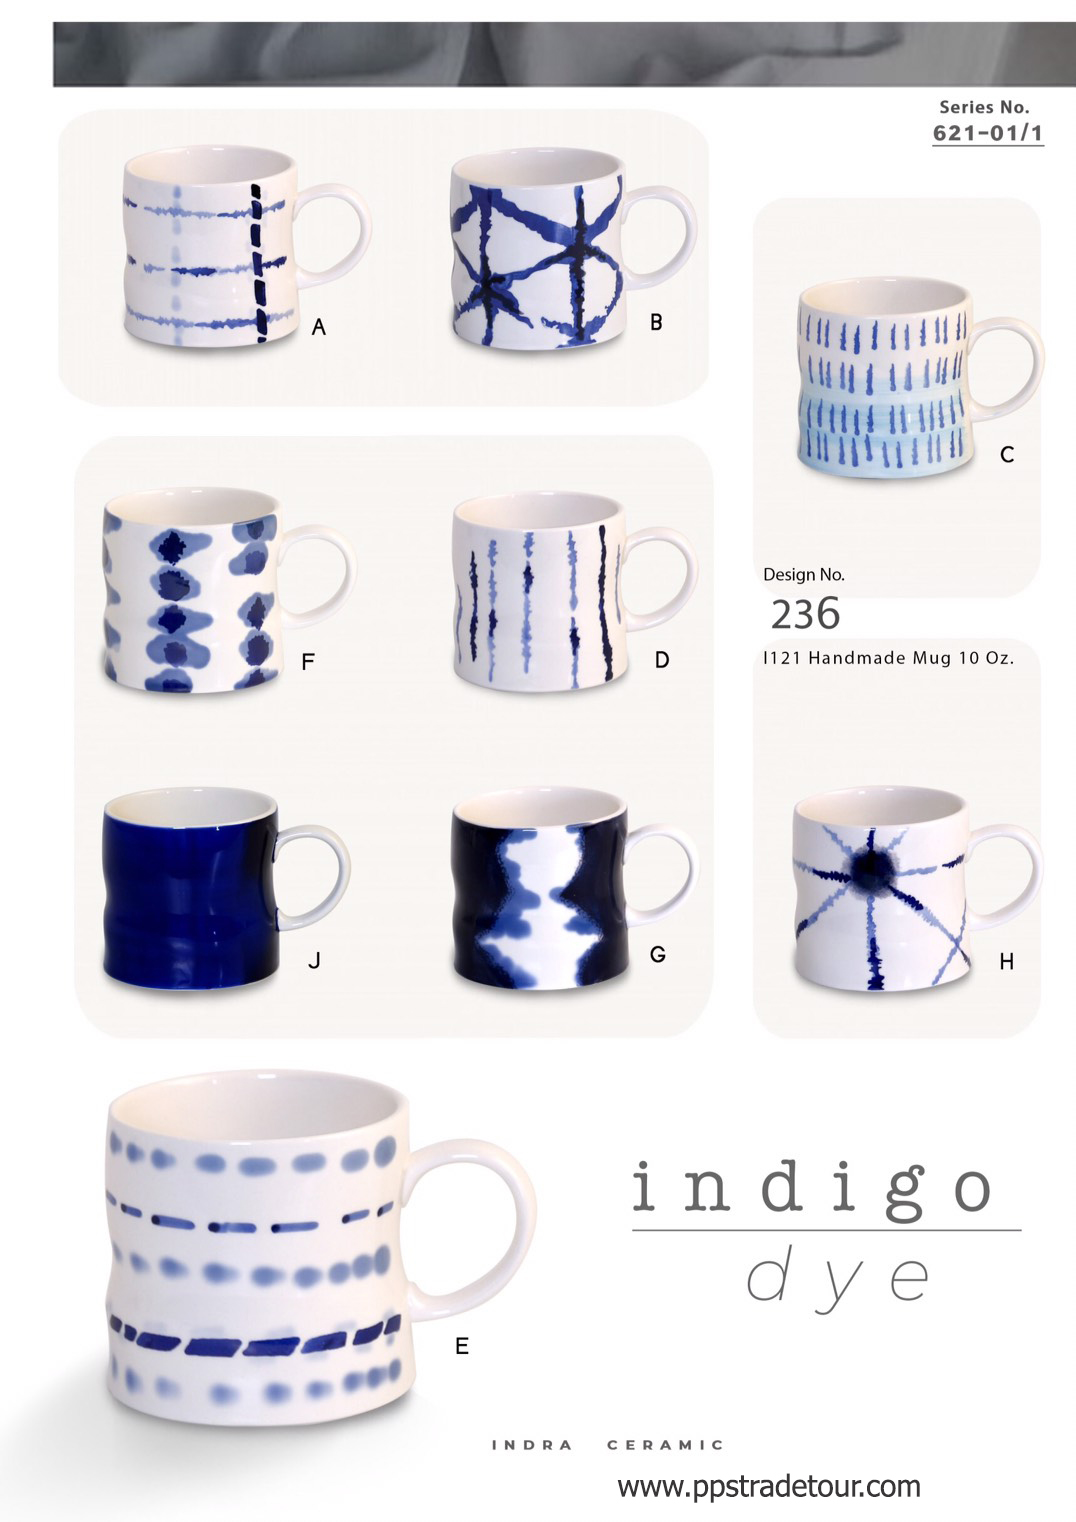 Indigo Dye-Ceramic Mug 10 Oz.